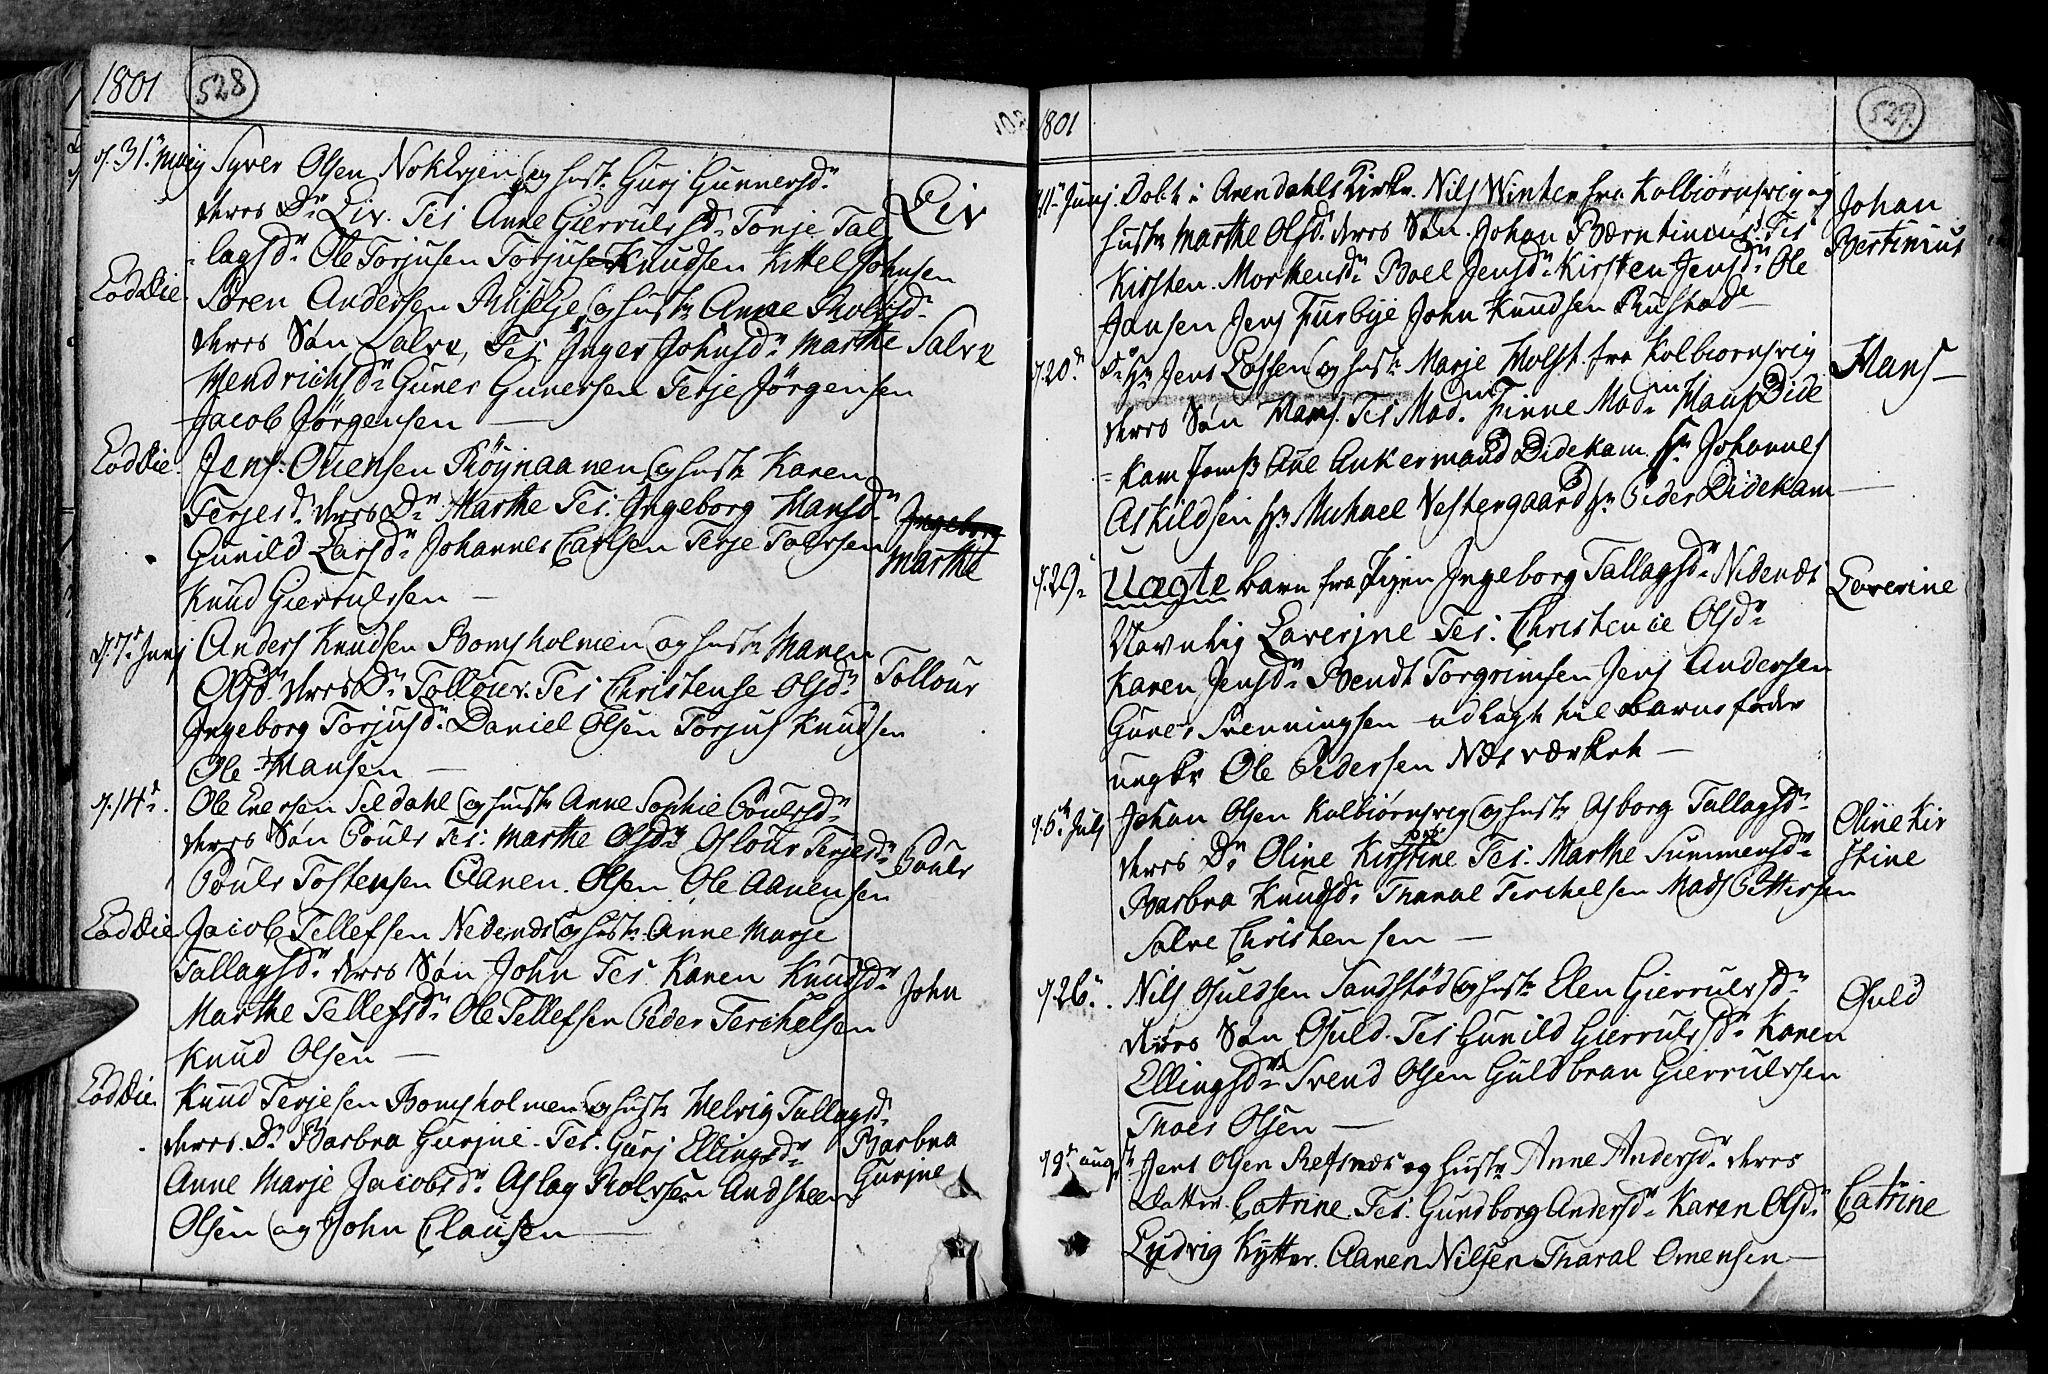 SAK, Øyestad sokneprestkontor, F/Fa/L0008: Ministerialbok nr. A 8, 1777-1804, s. 528-529